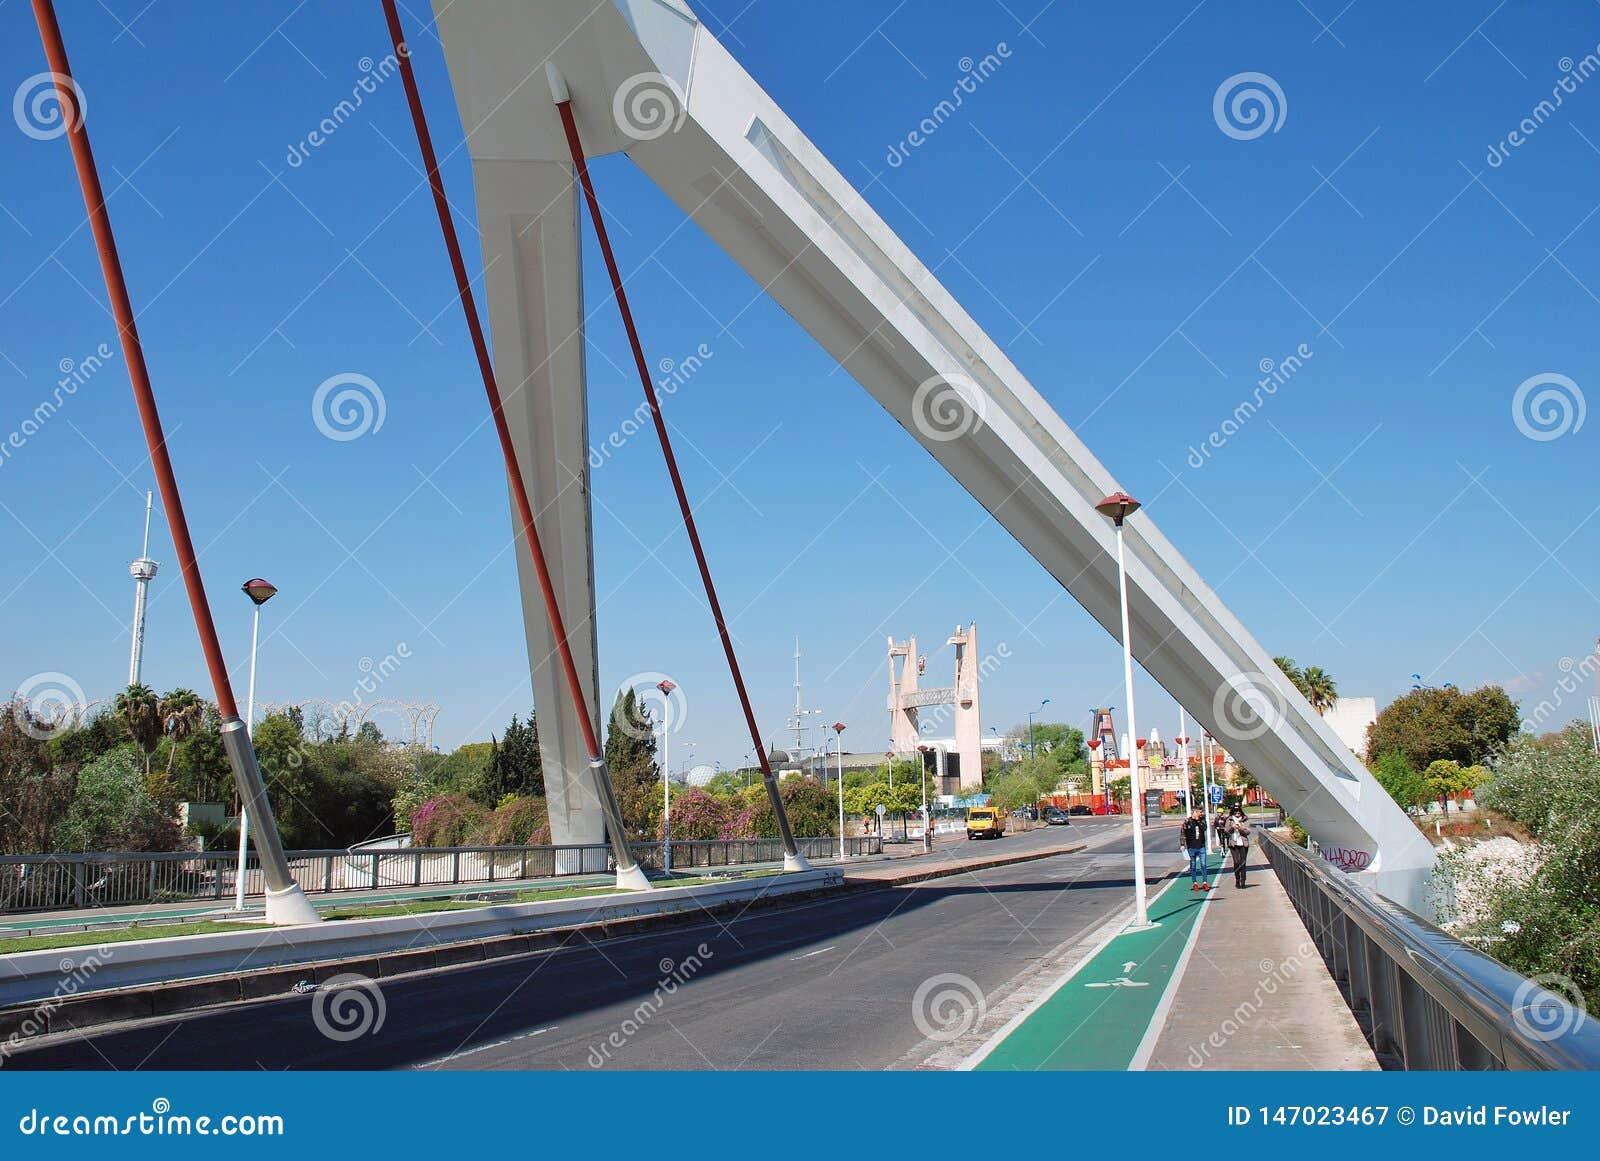 Barqueta most, Seville